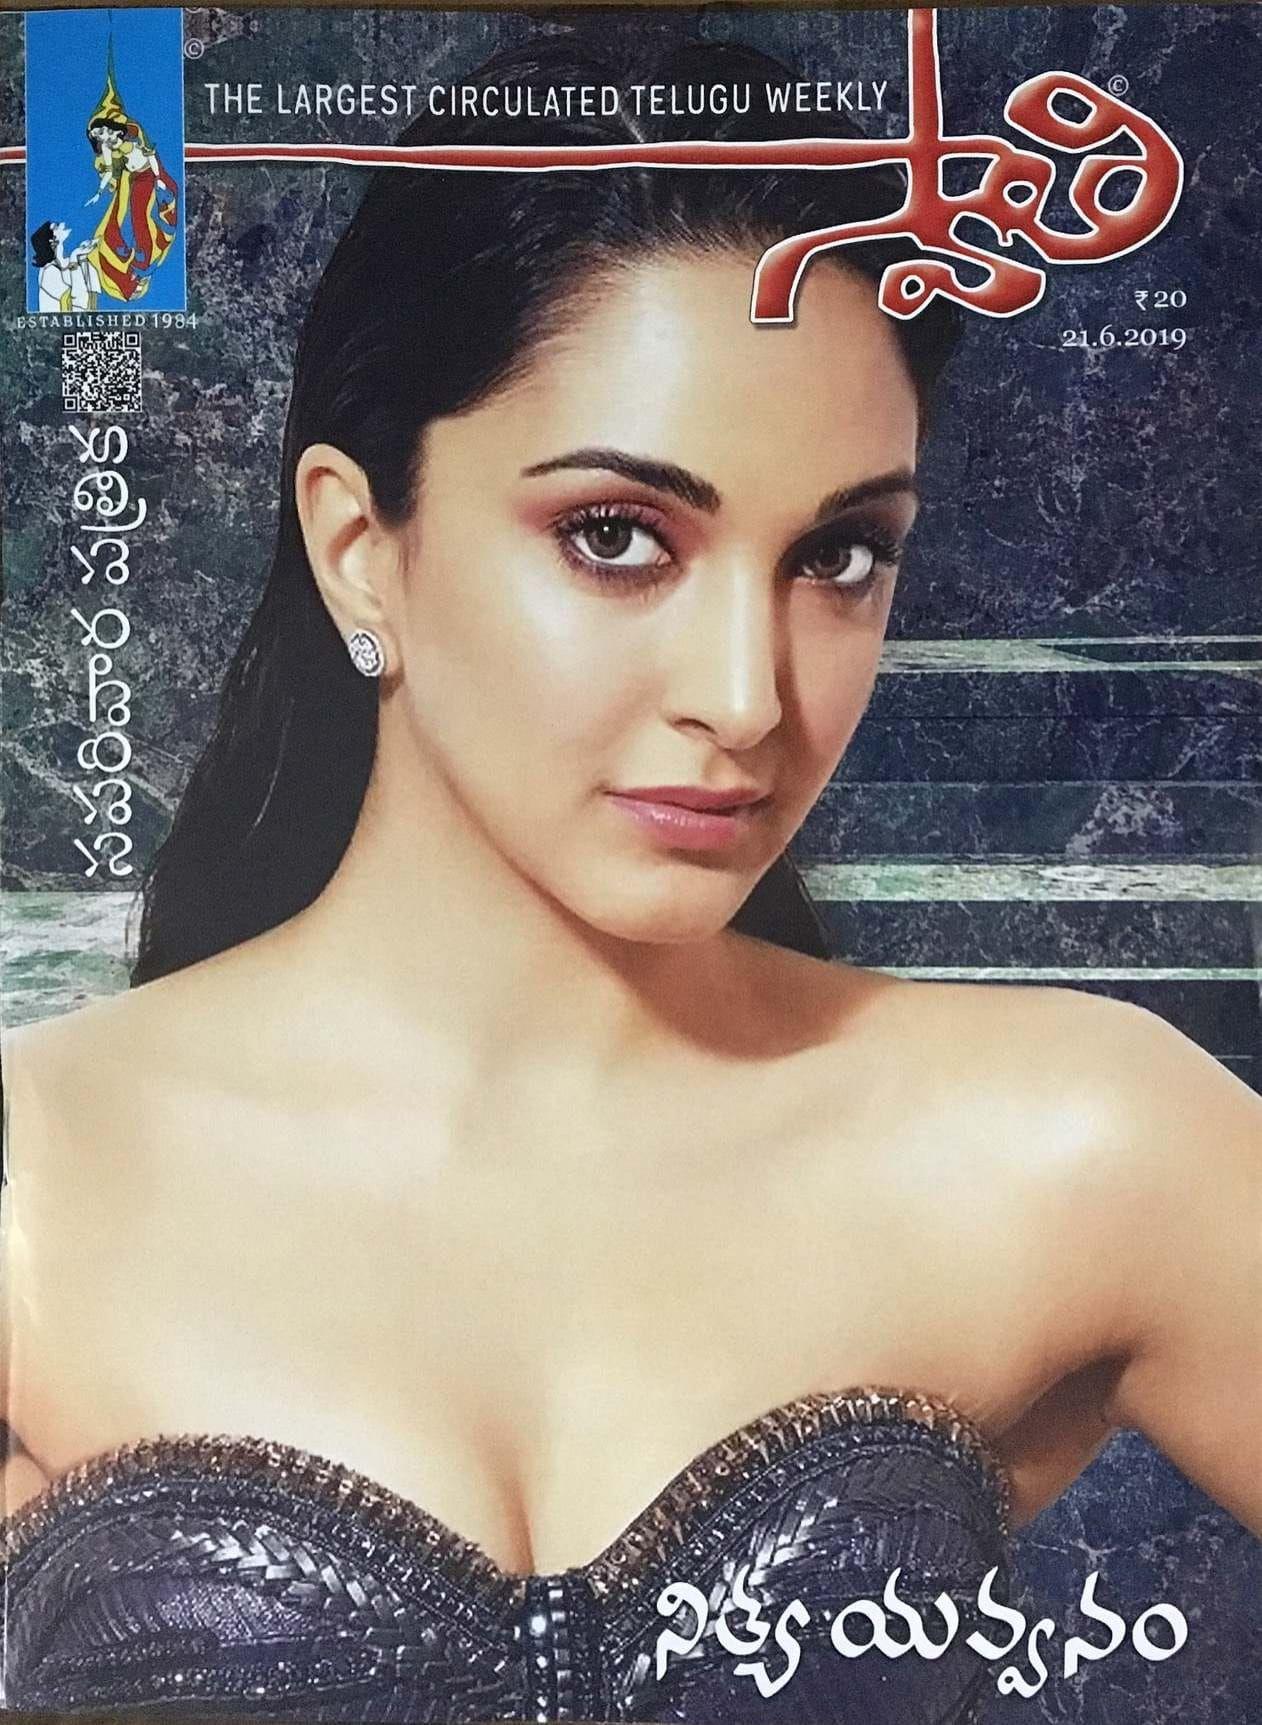 Swathi Weekly 21st June 2019 | News | June, Monthly magazine